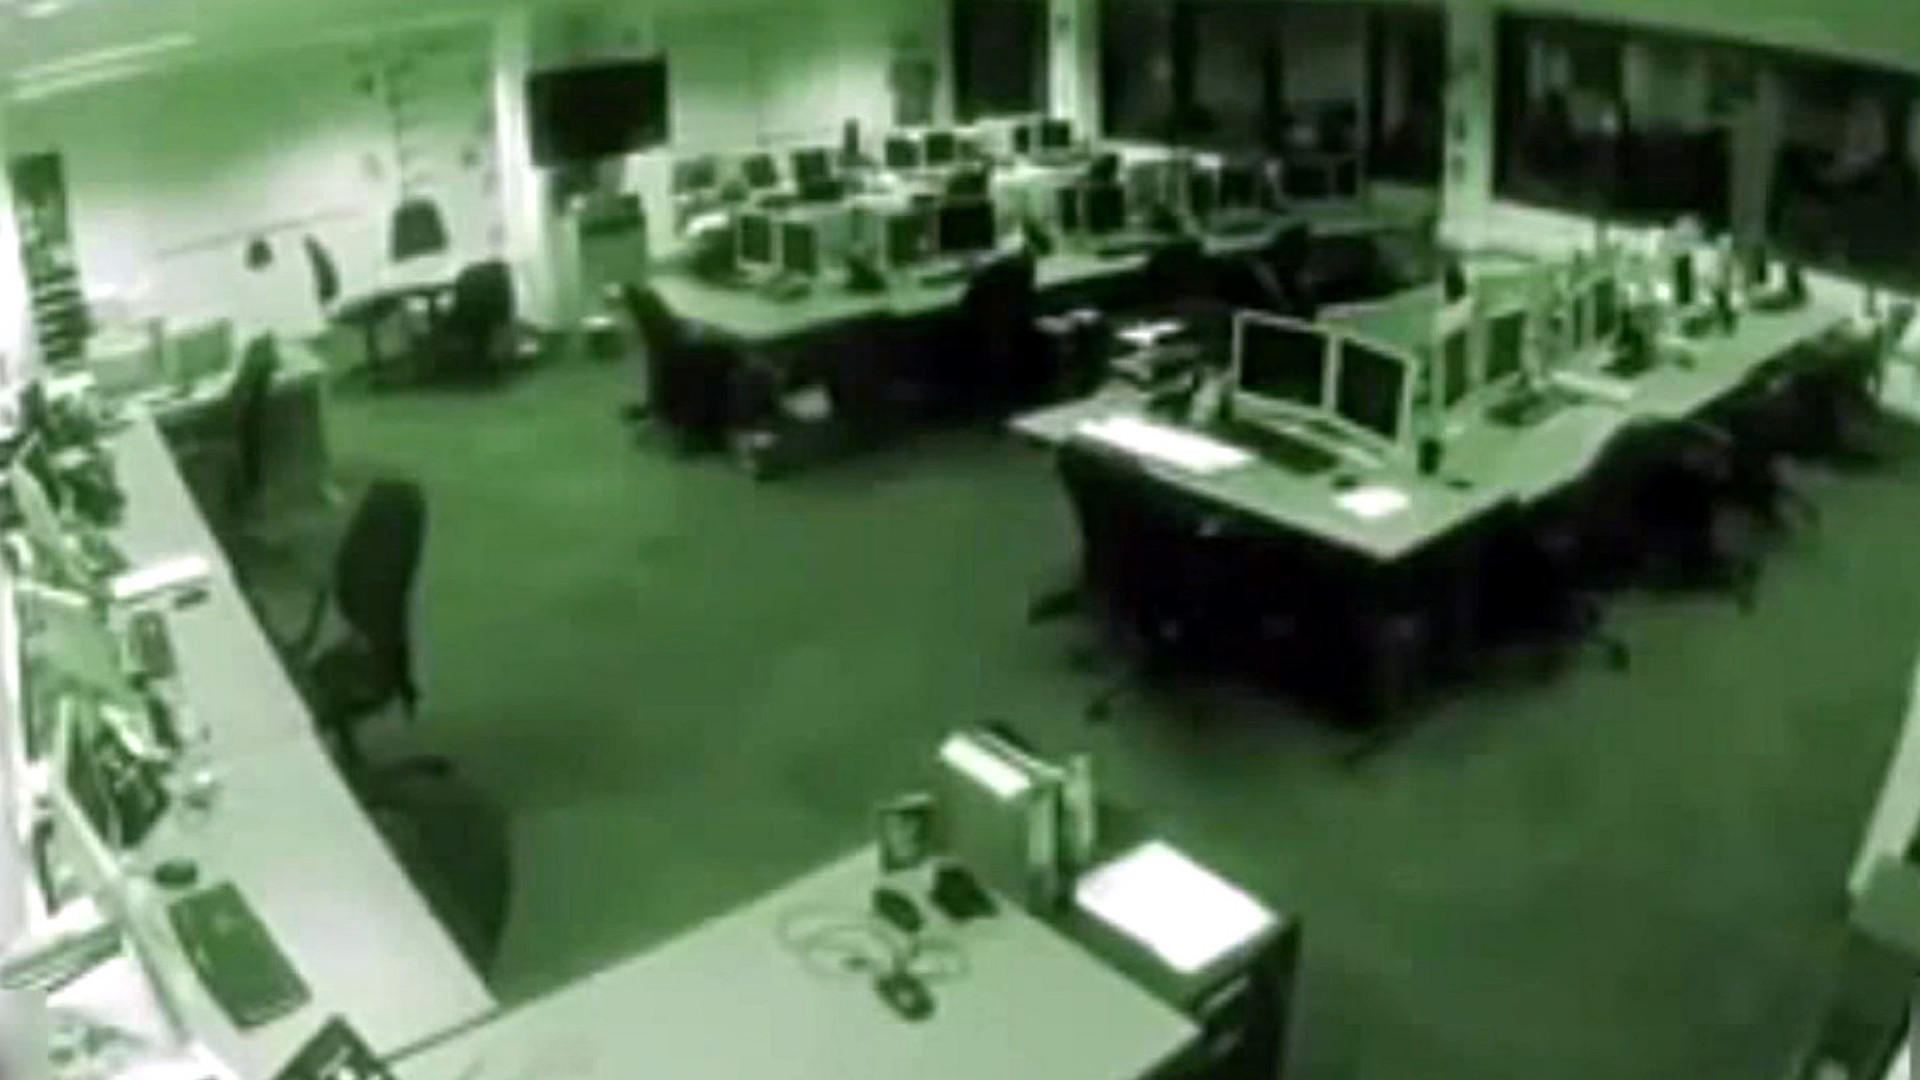 Leaked CCTV footage shows Jeremy Clarkson's fracas [video]